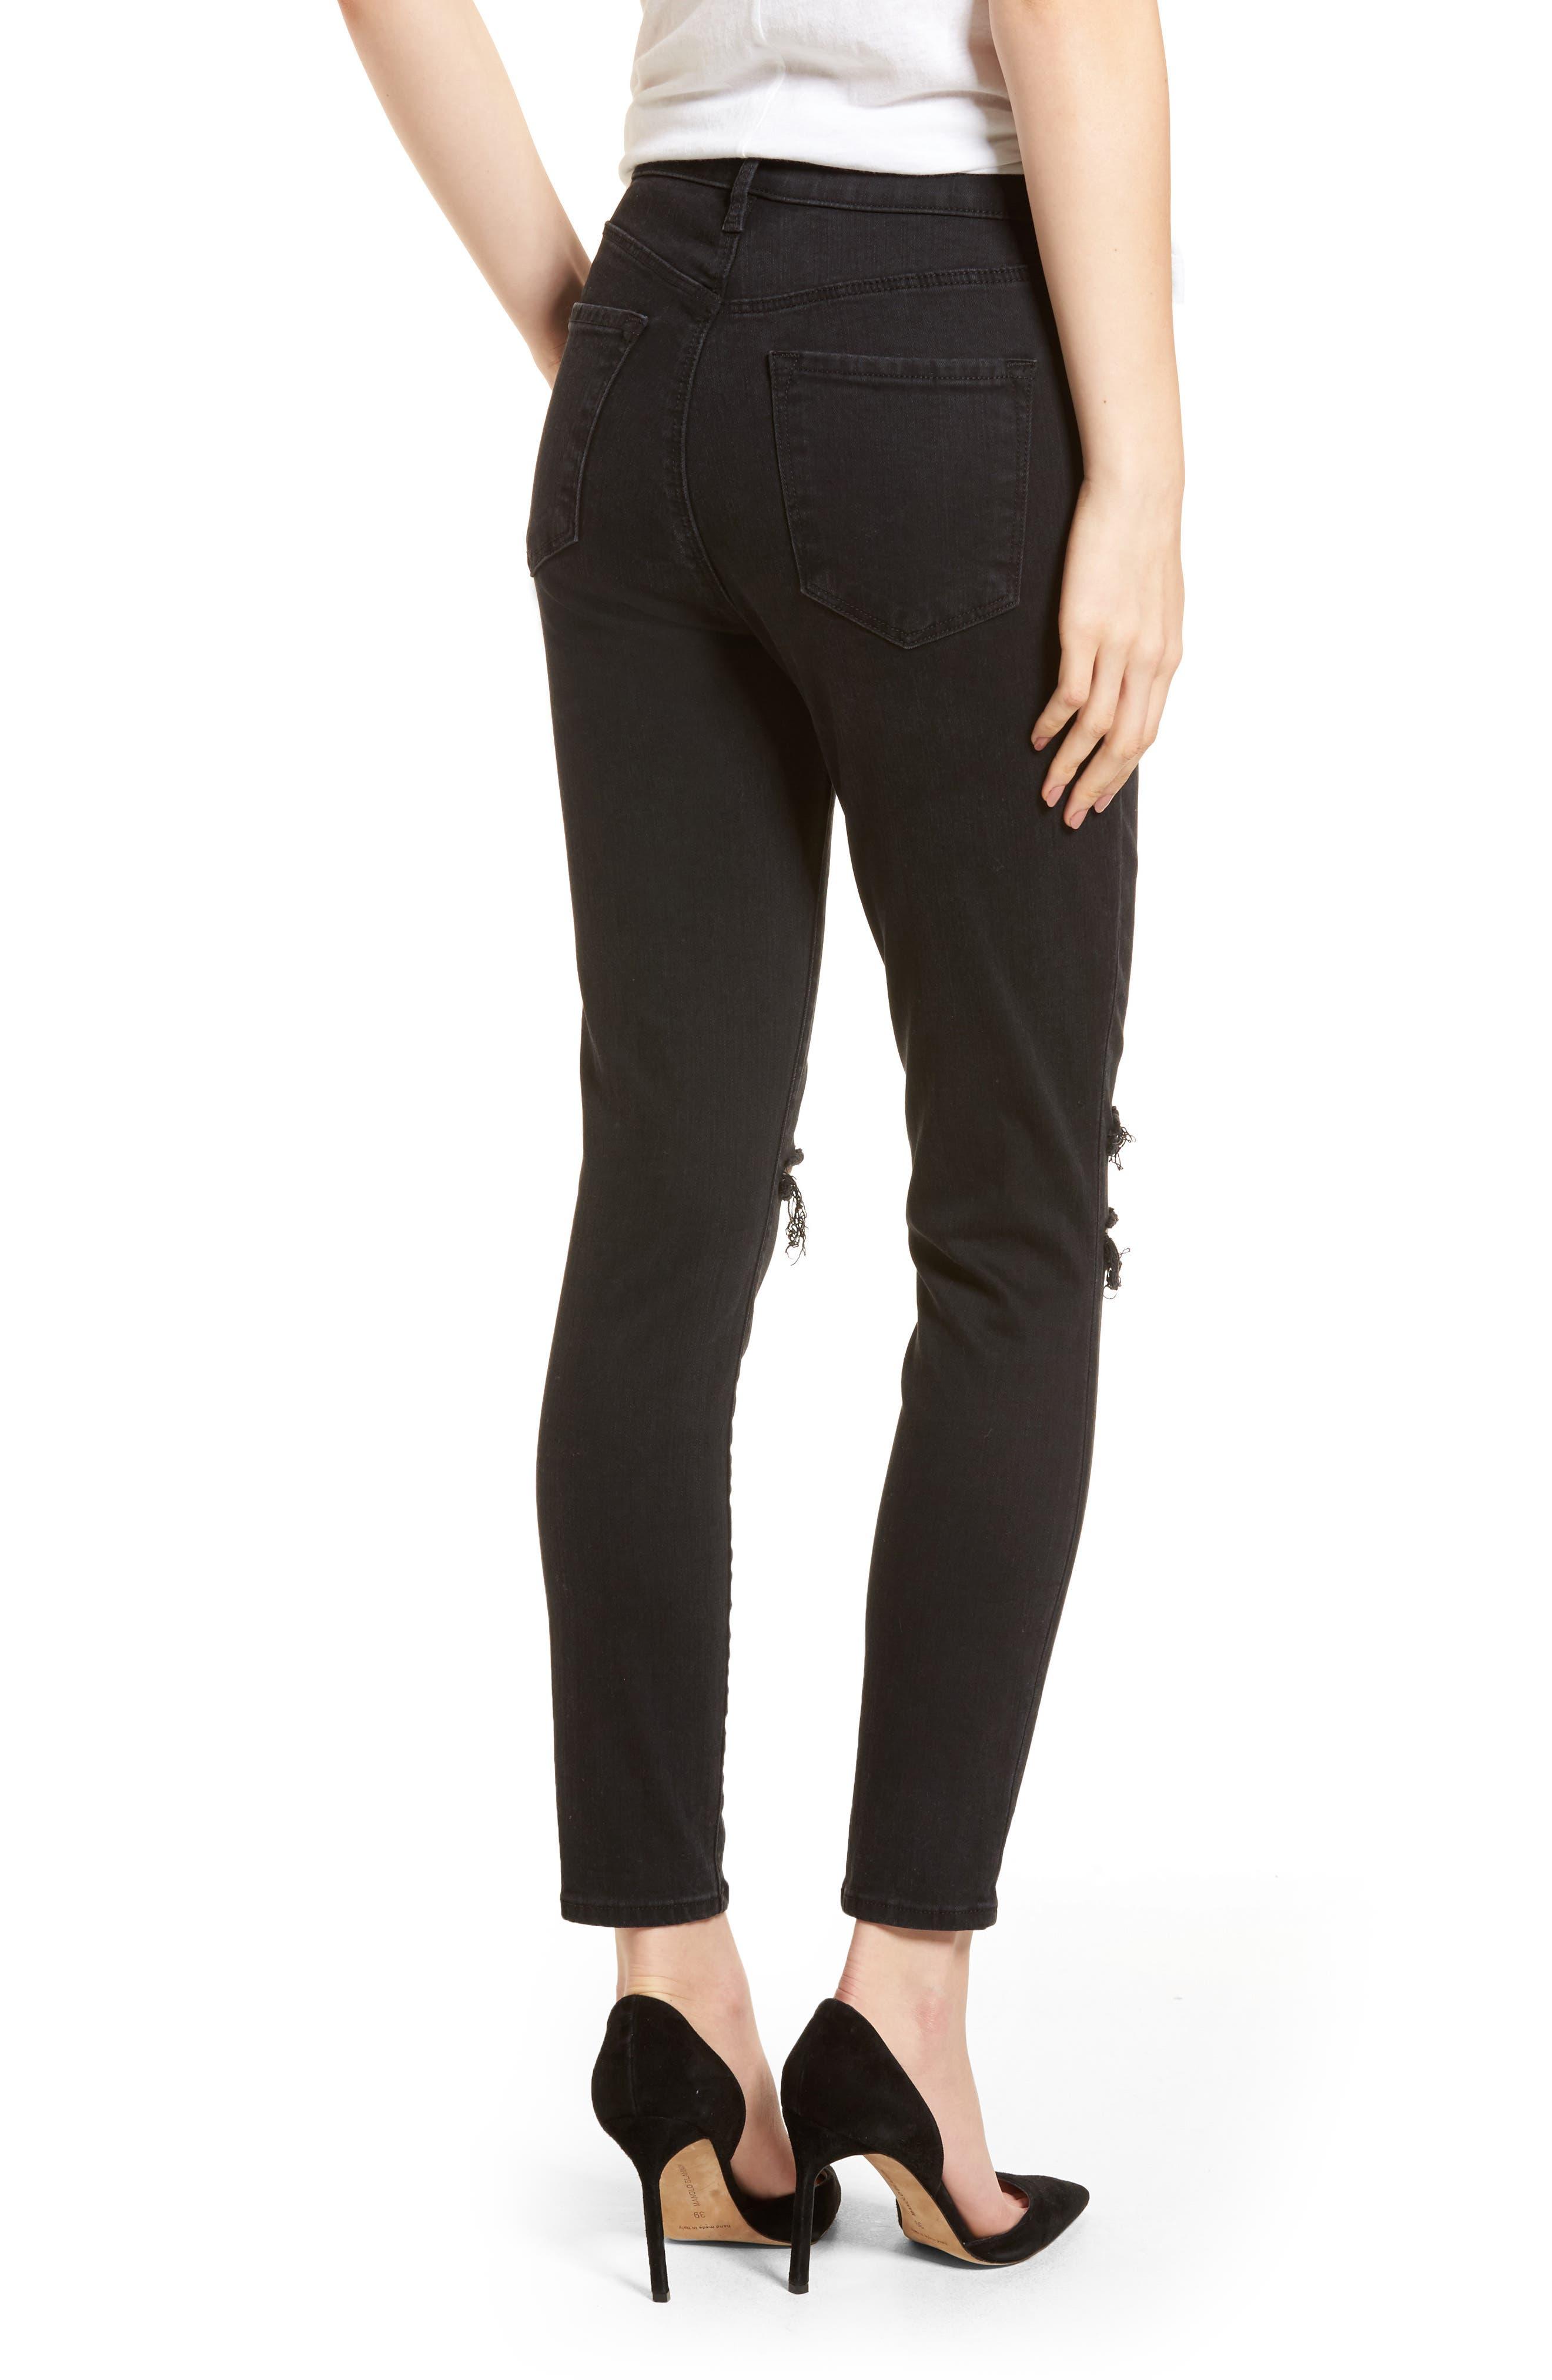 Alana High Waist Ankle Skinny Jeans,                             Alternate thumbnail 2, color,                             BLACK MERCY